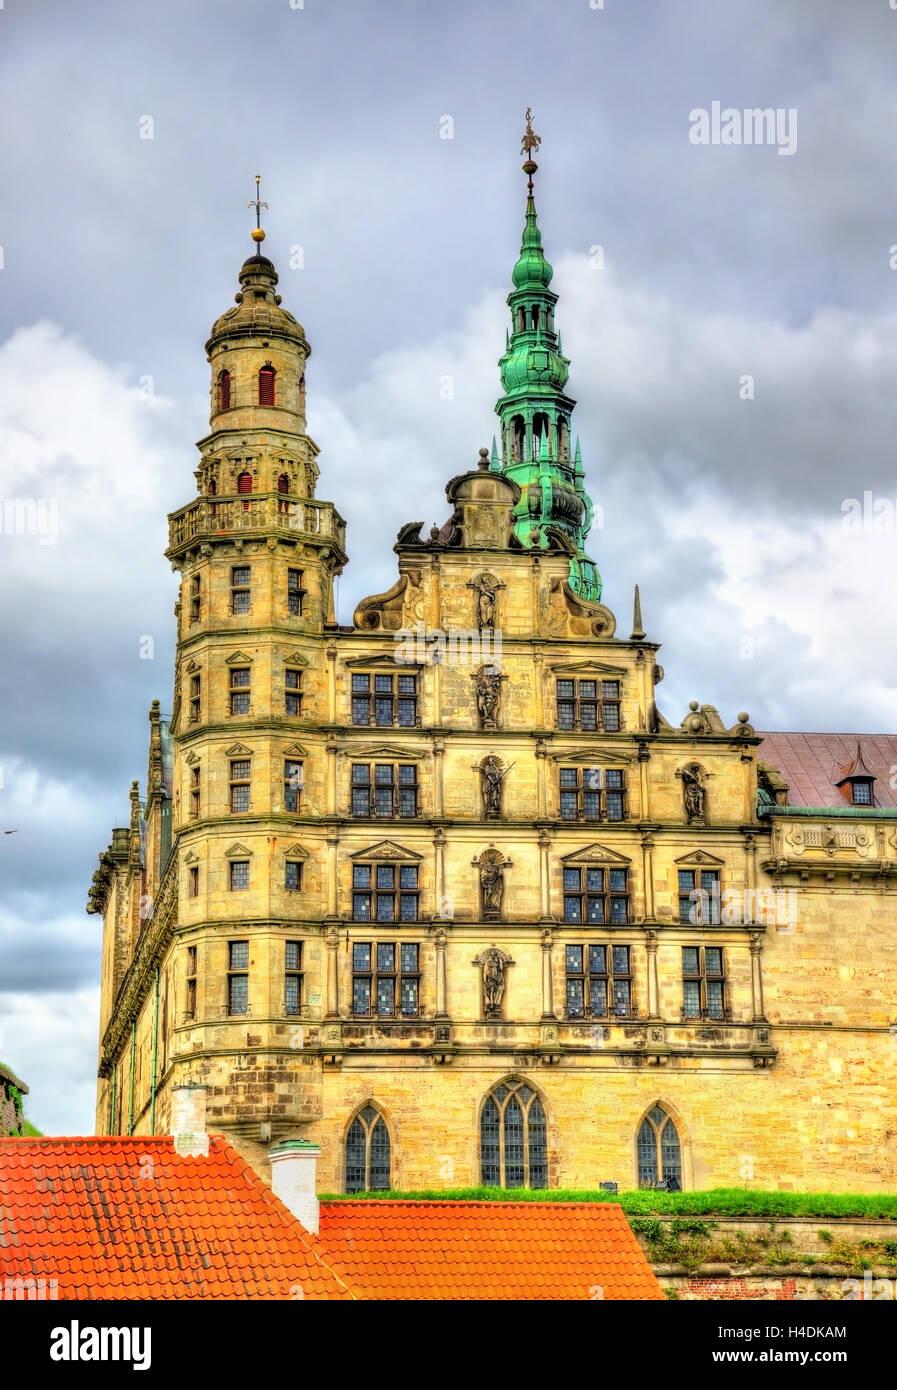 Kronborg Castle, known as Elsinore in the Tragedy of Hamlet - Helsingor, Denmark - Stock Image